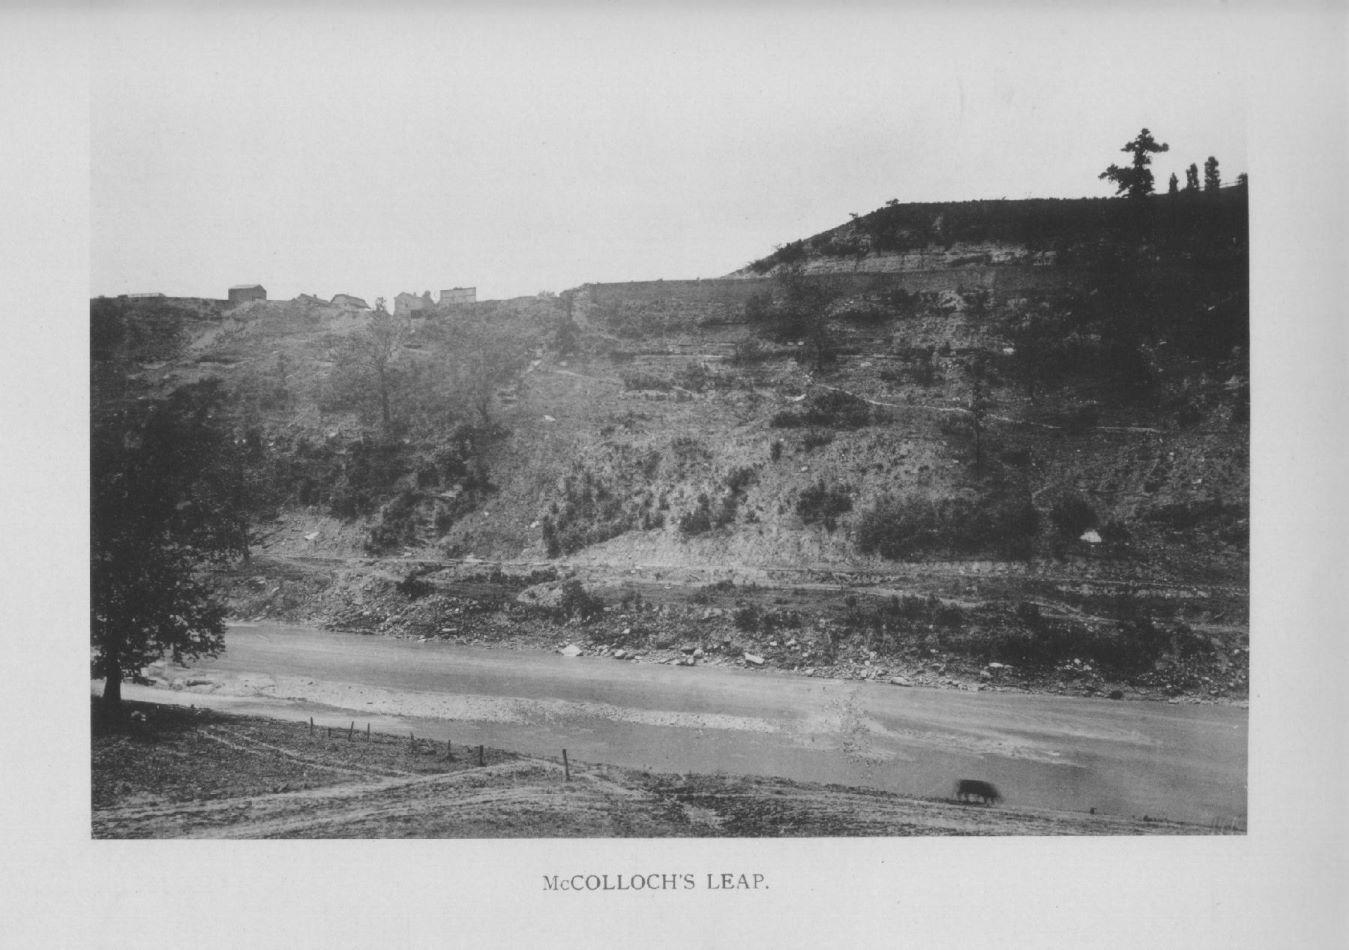 McCulloch's Leap, Wheeling, West Virginia